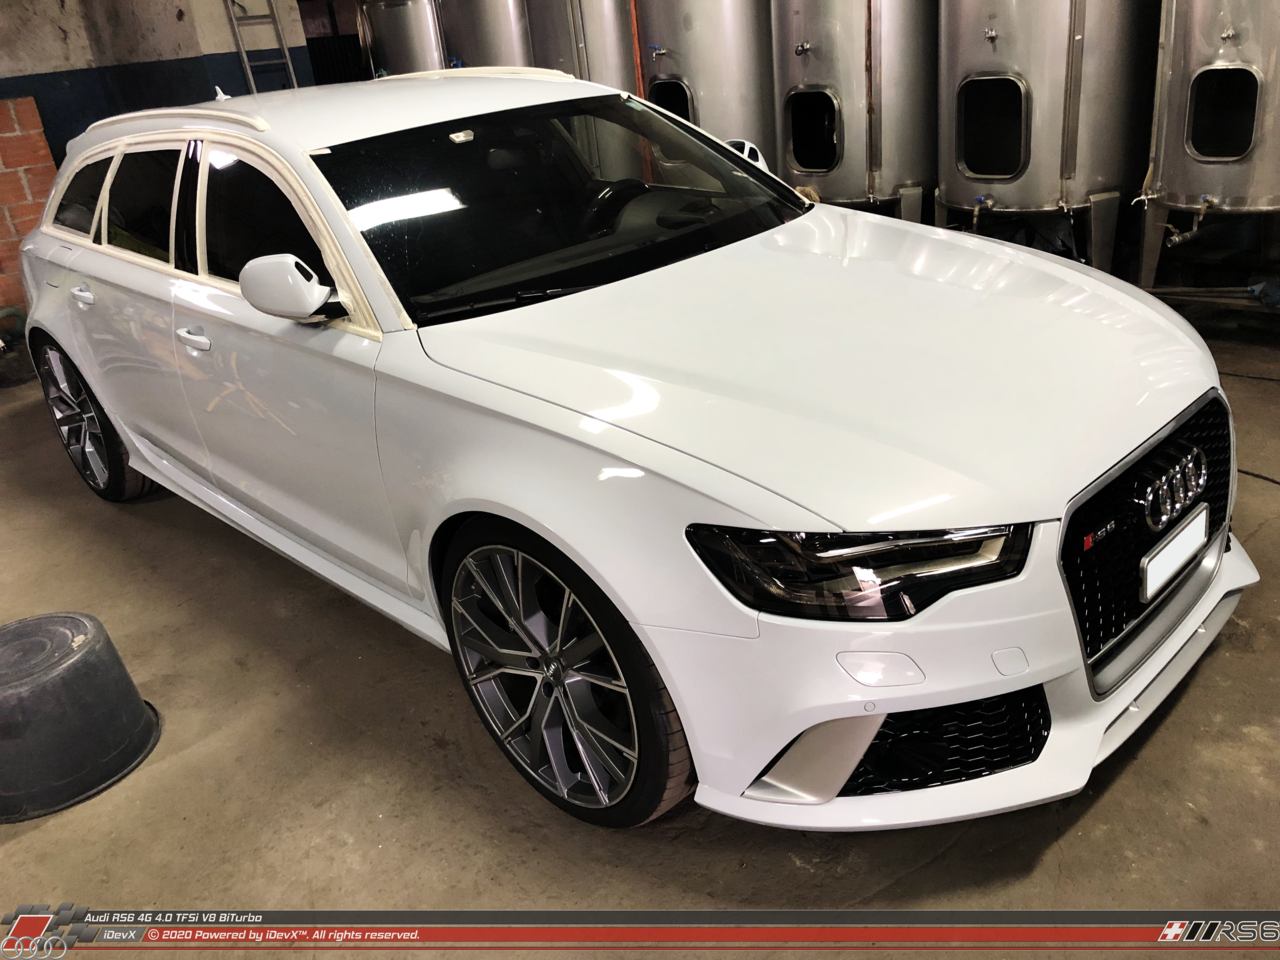 05_08.2019_Audi-RS6_iDevX_011.png